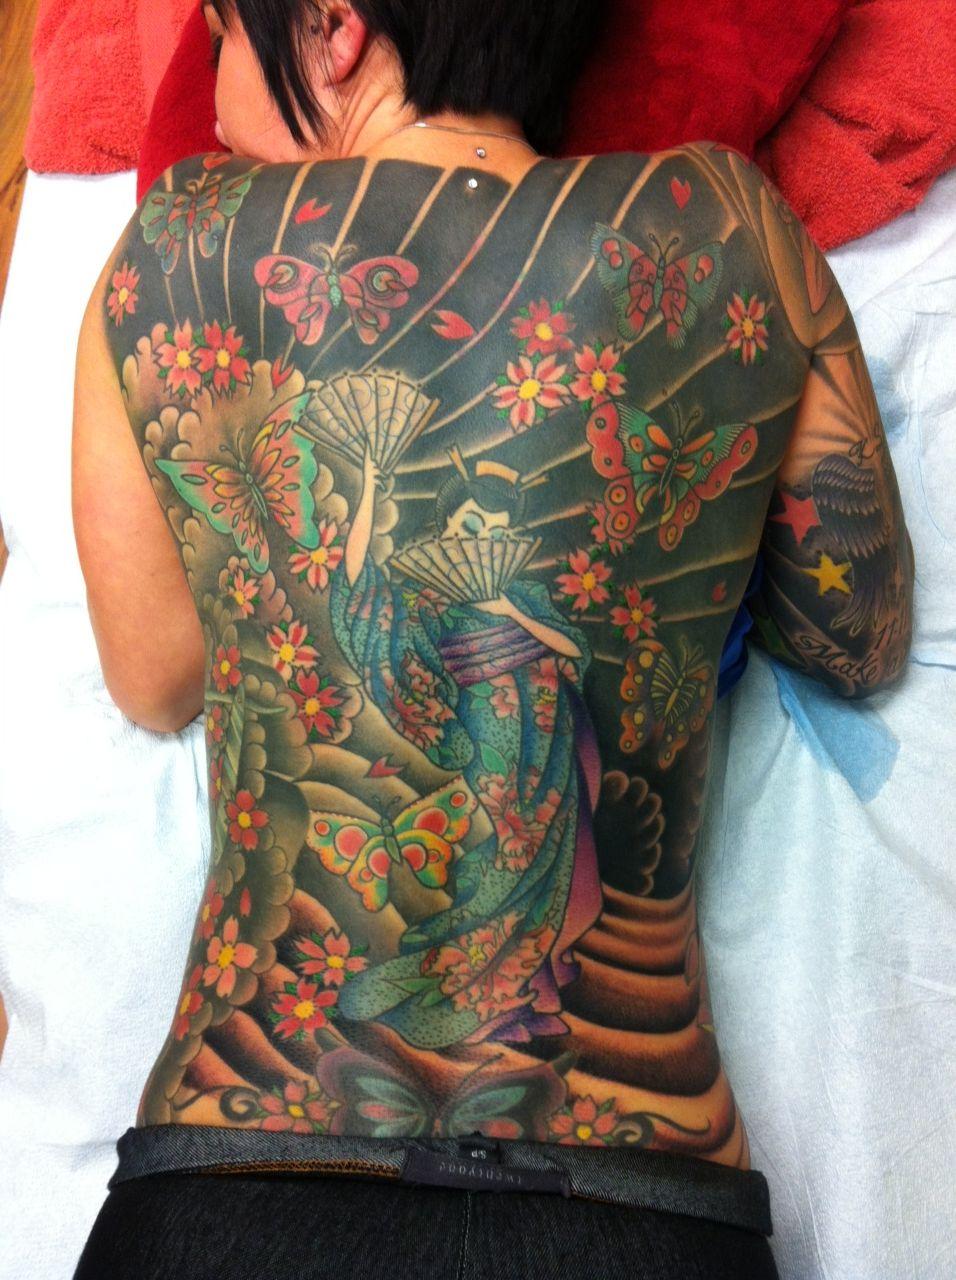 Full back geisha girl tattoo! Heather and her awesomeness